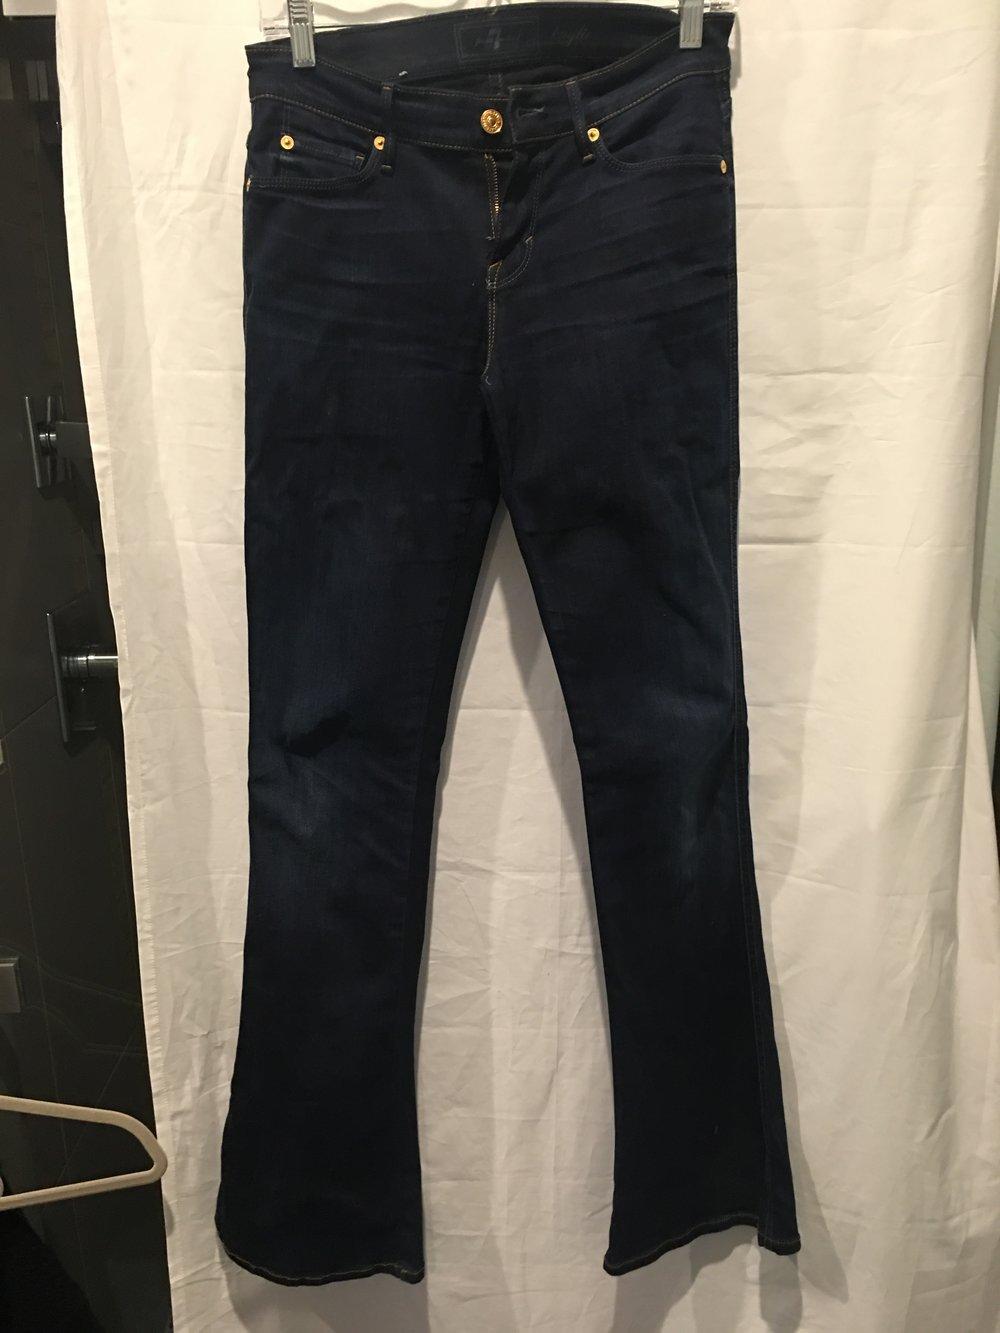 Bootcut 7 Jeans.jpg